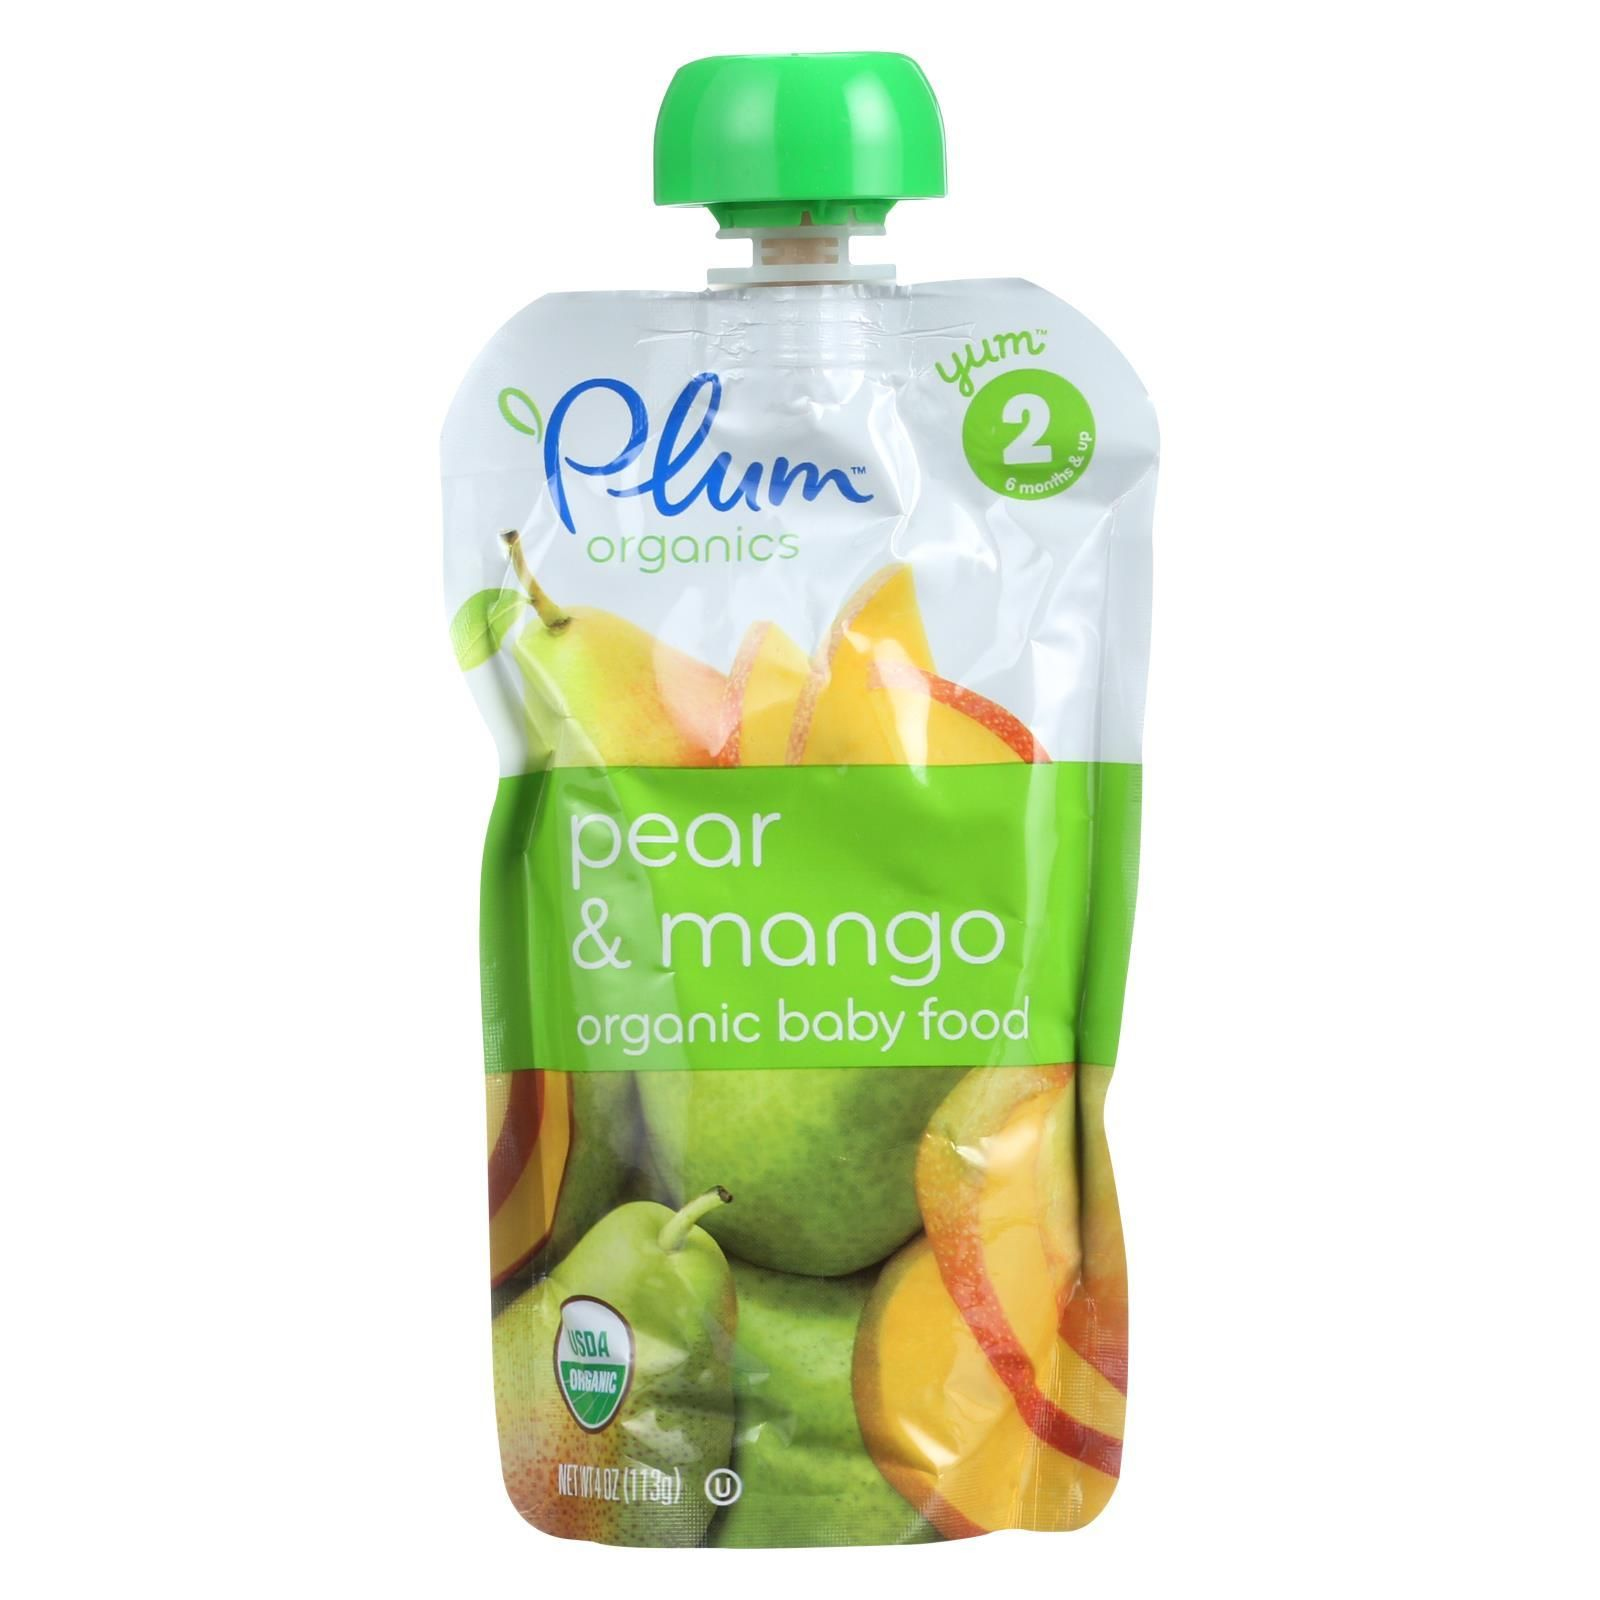 Plum organics baby food organic pear and mango stage